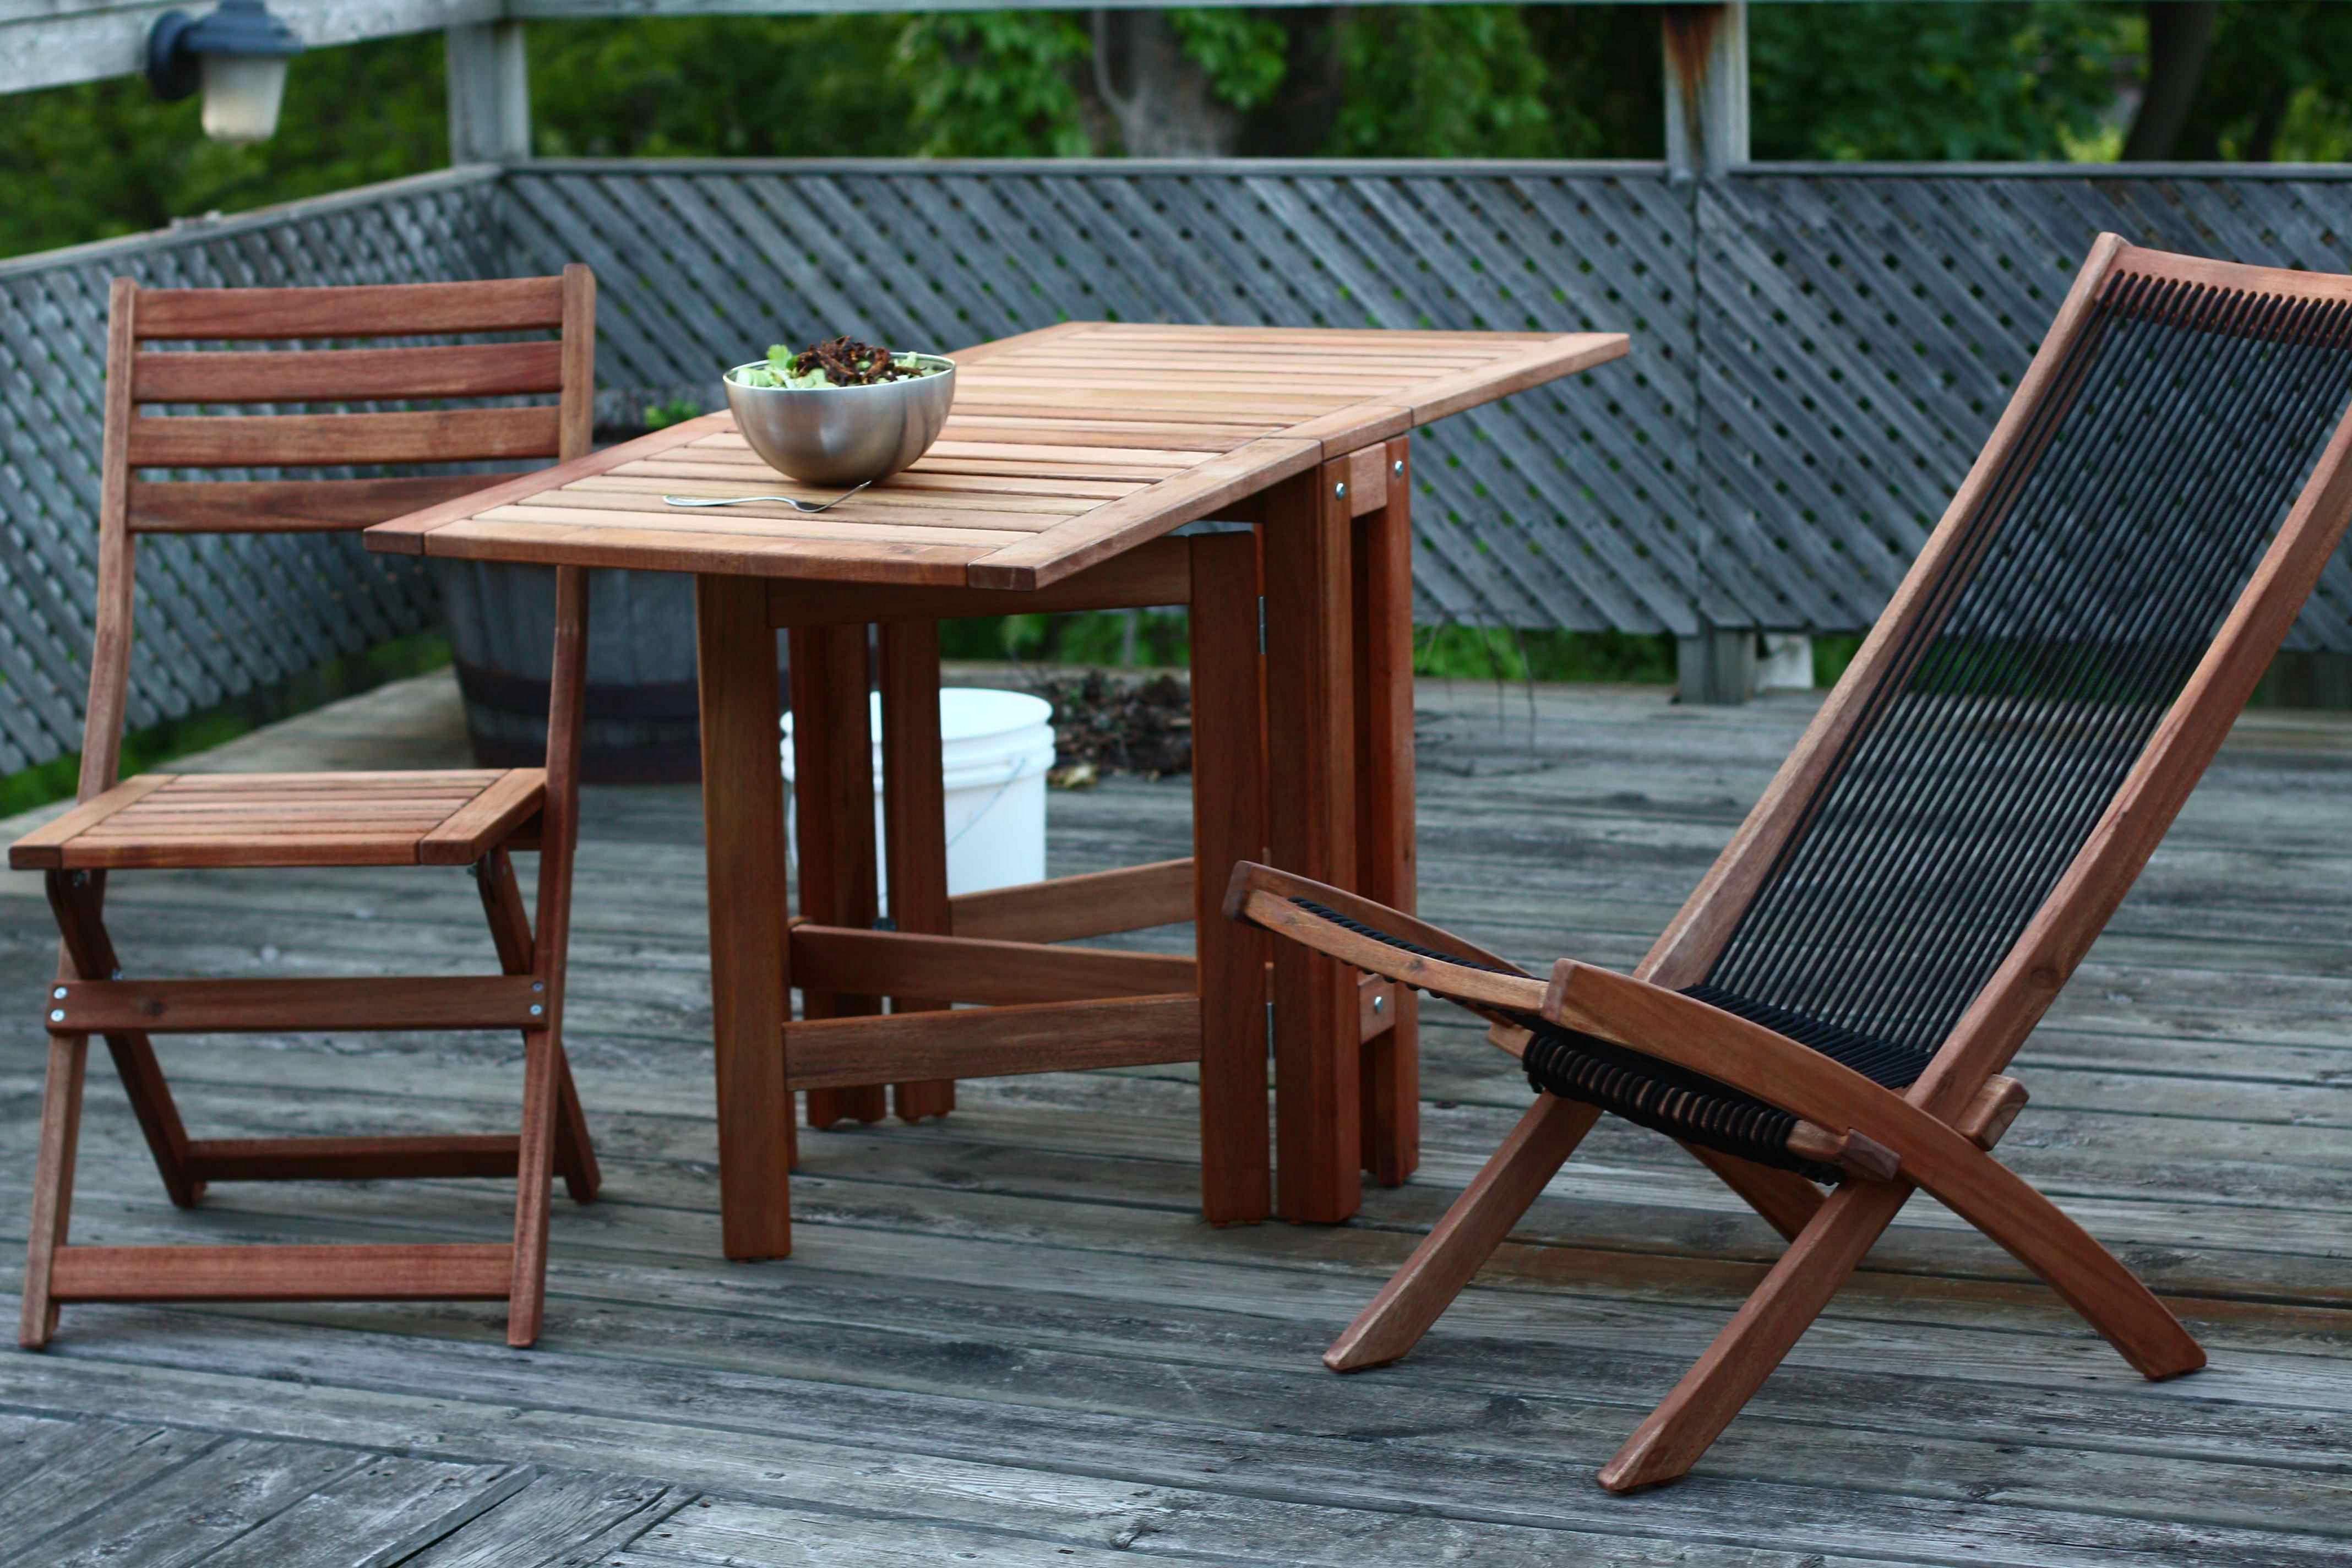 12 Minimalist Chair Ideas For Front Porch Design Ikea